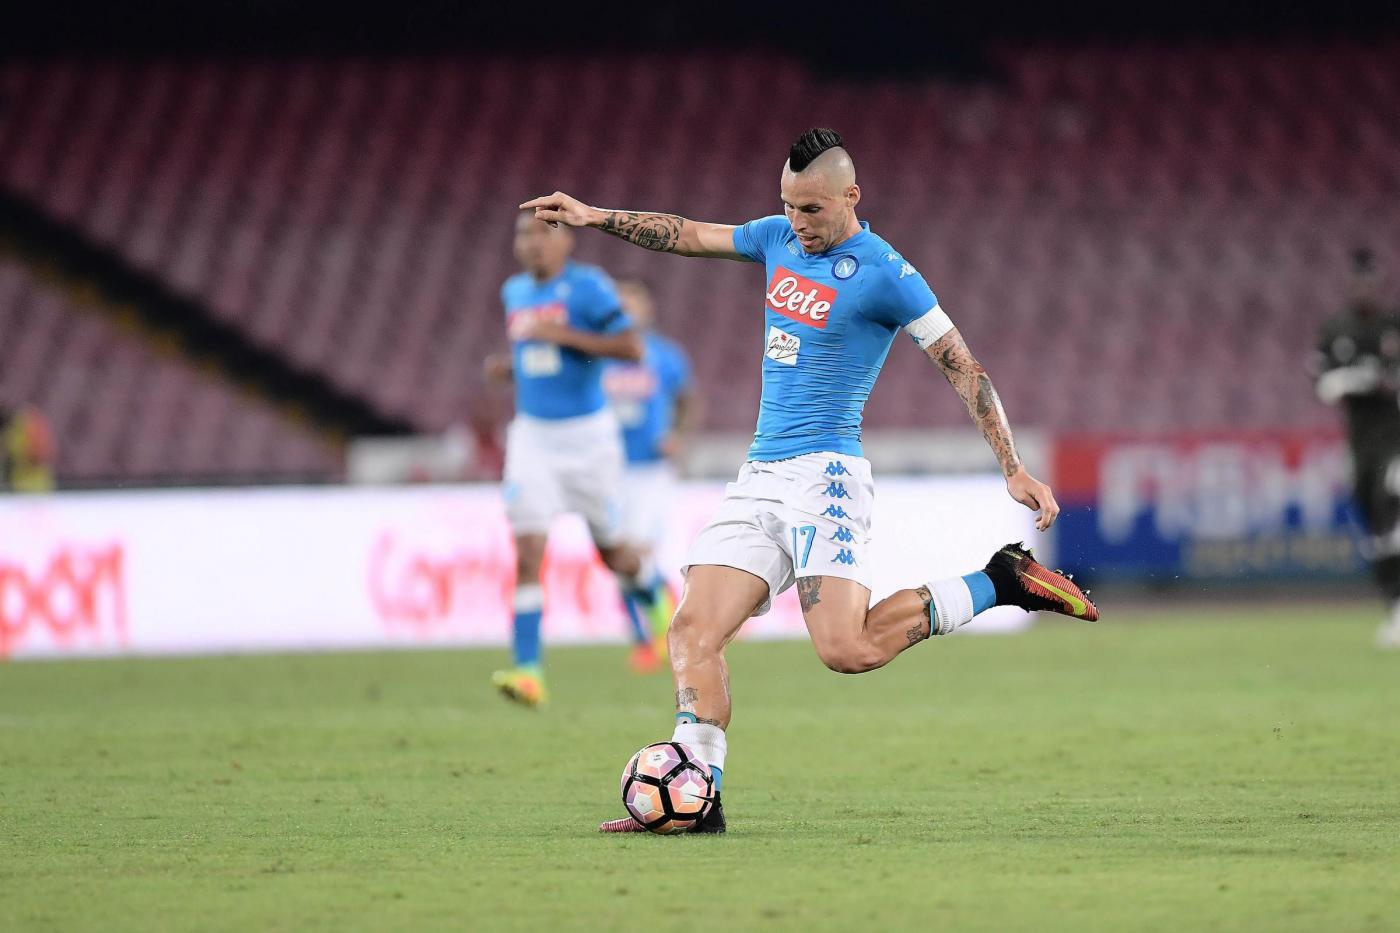 Napoli vs bologna live webcam